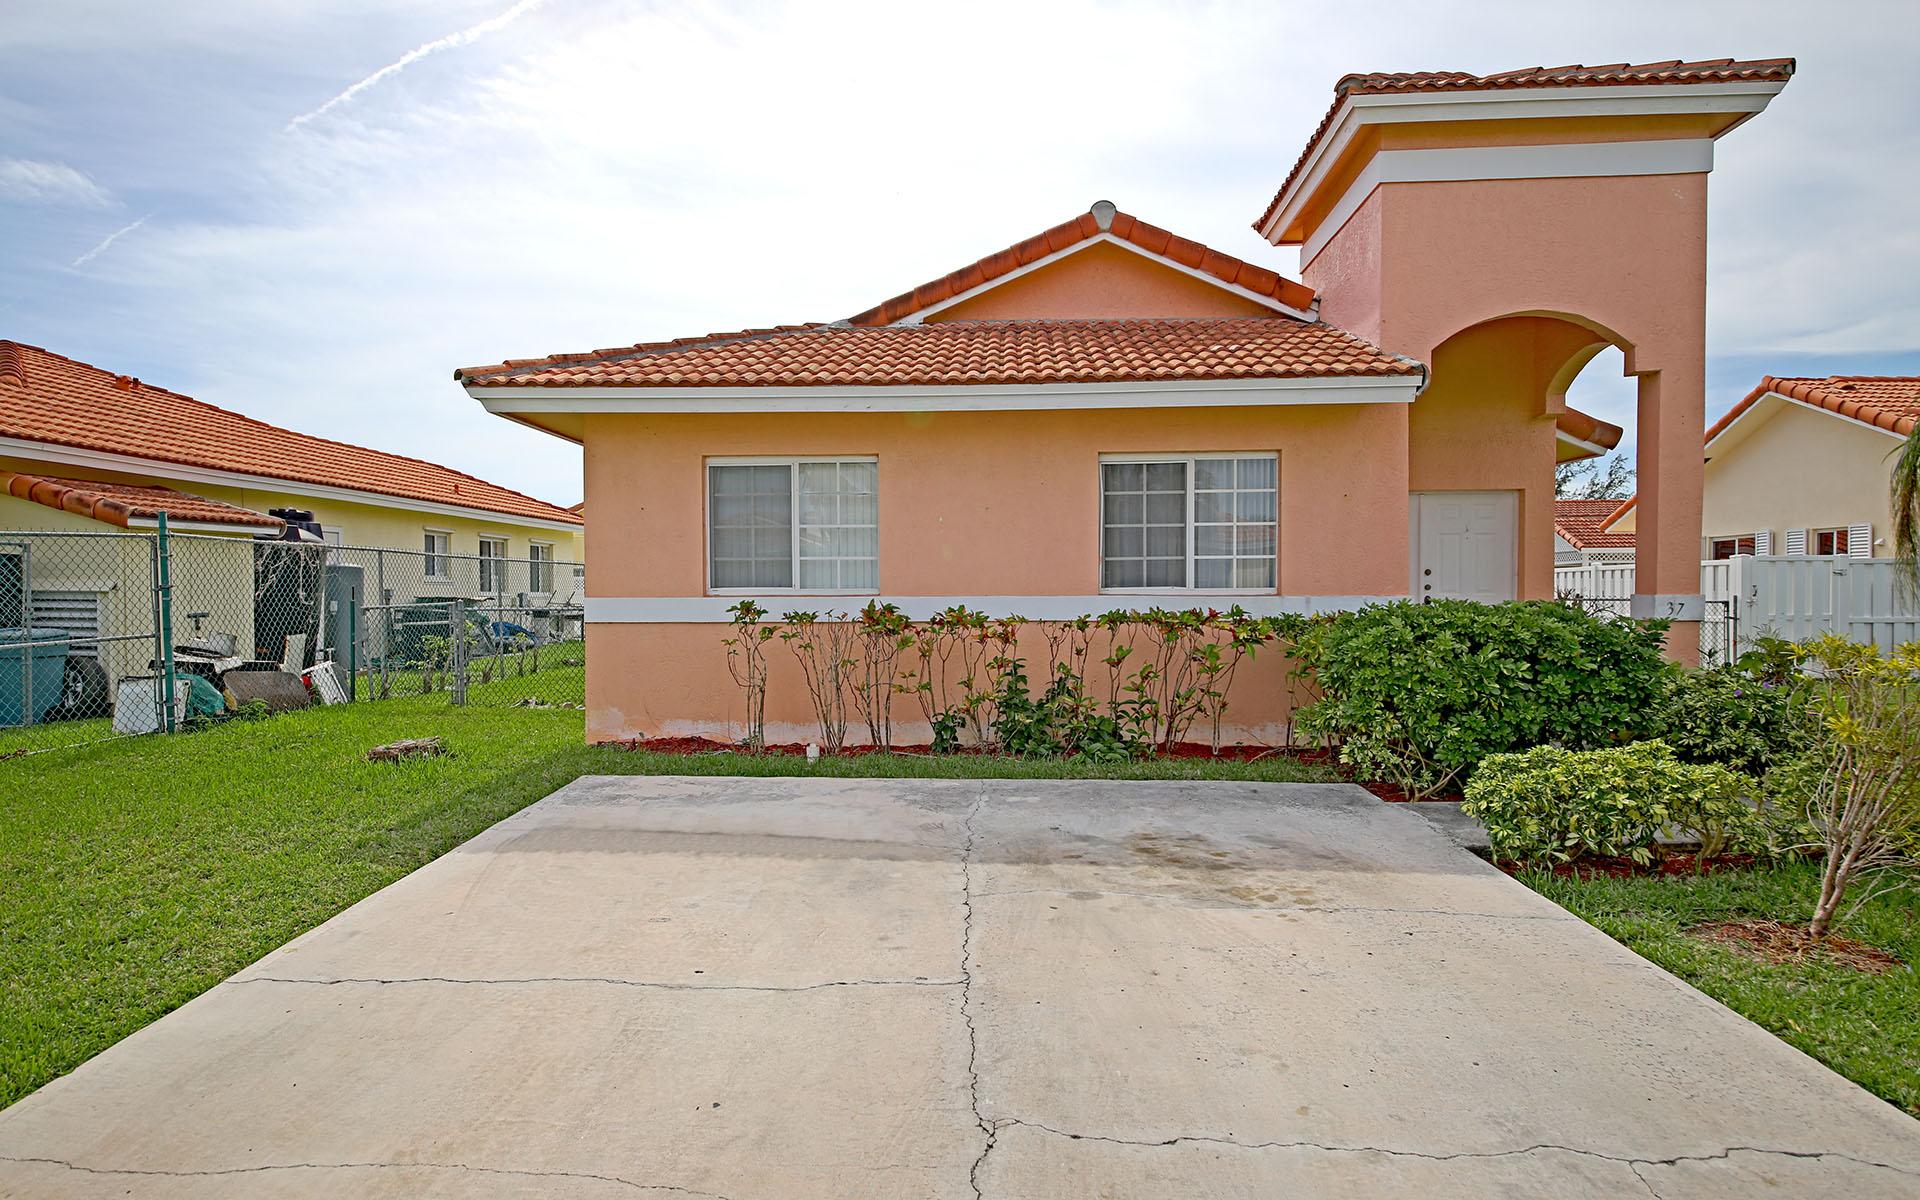 Single Family Home for Sale at # 37 Crystal Close West Treasure Cove - MLS 28359 Treasure Cove, Yamacraw, Nassau And Paradise Island Bahamas